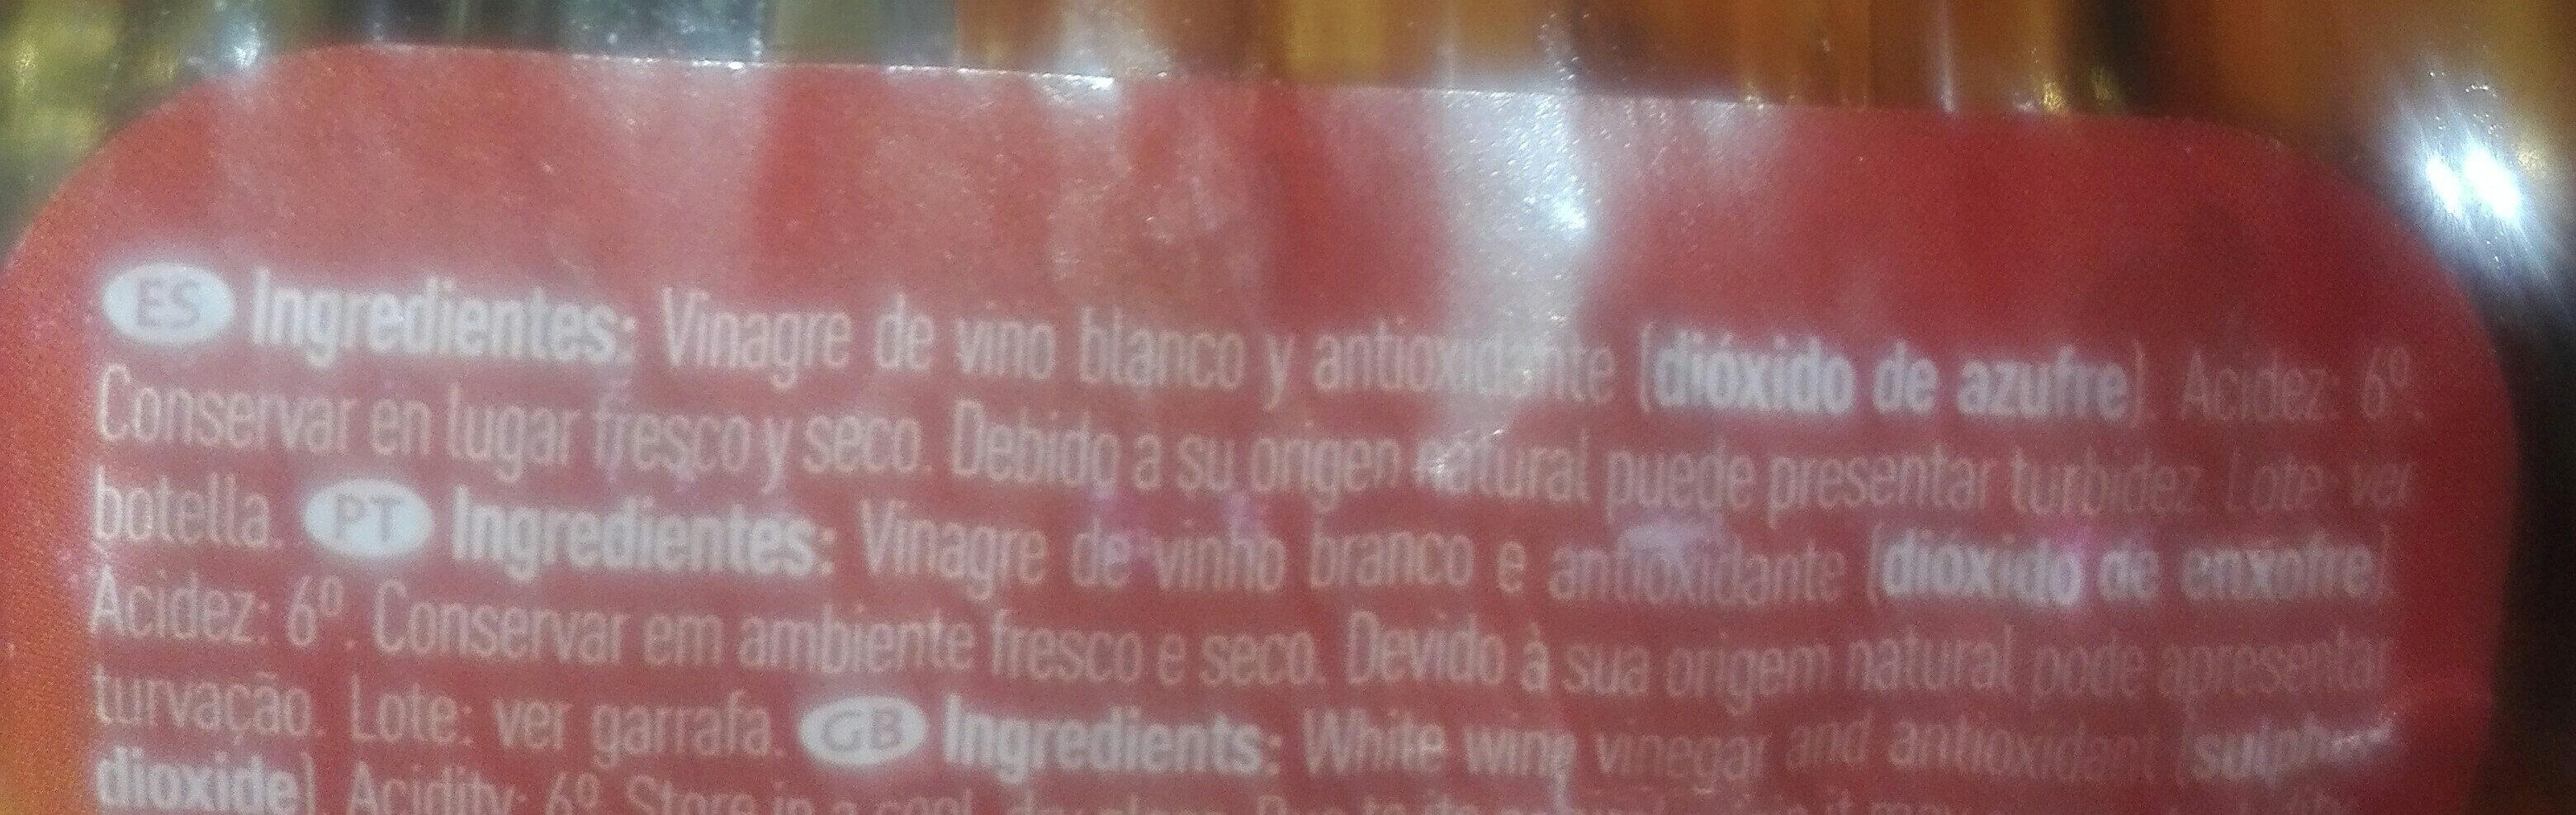 Vinagre de vino blanco - Ingredientes